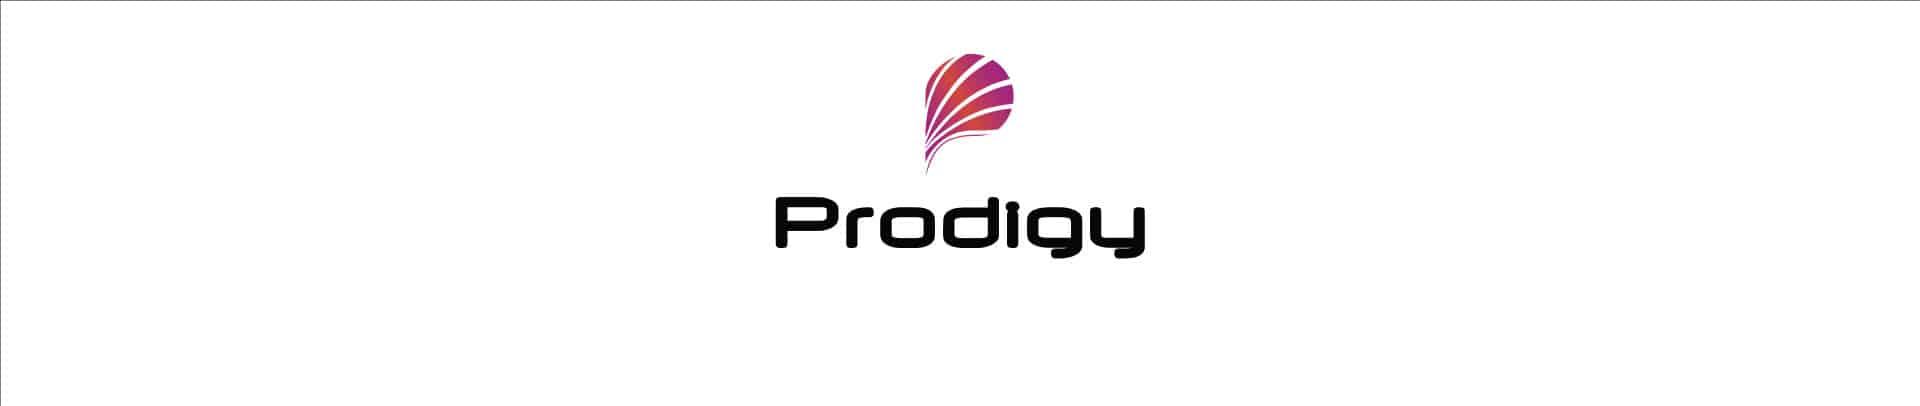 Web-banner_prodigy-logo